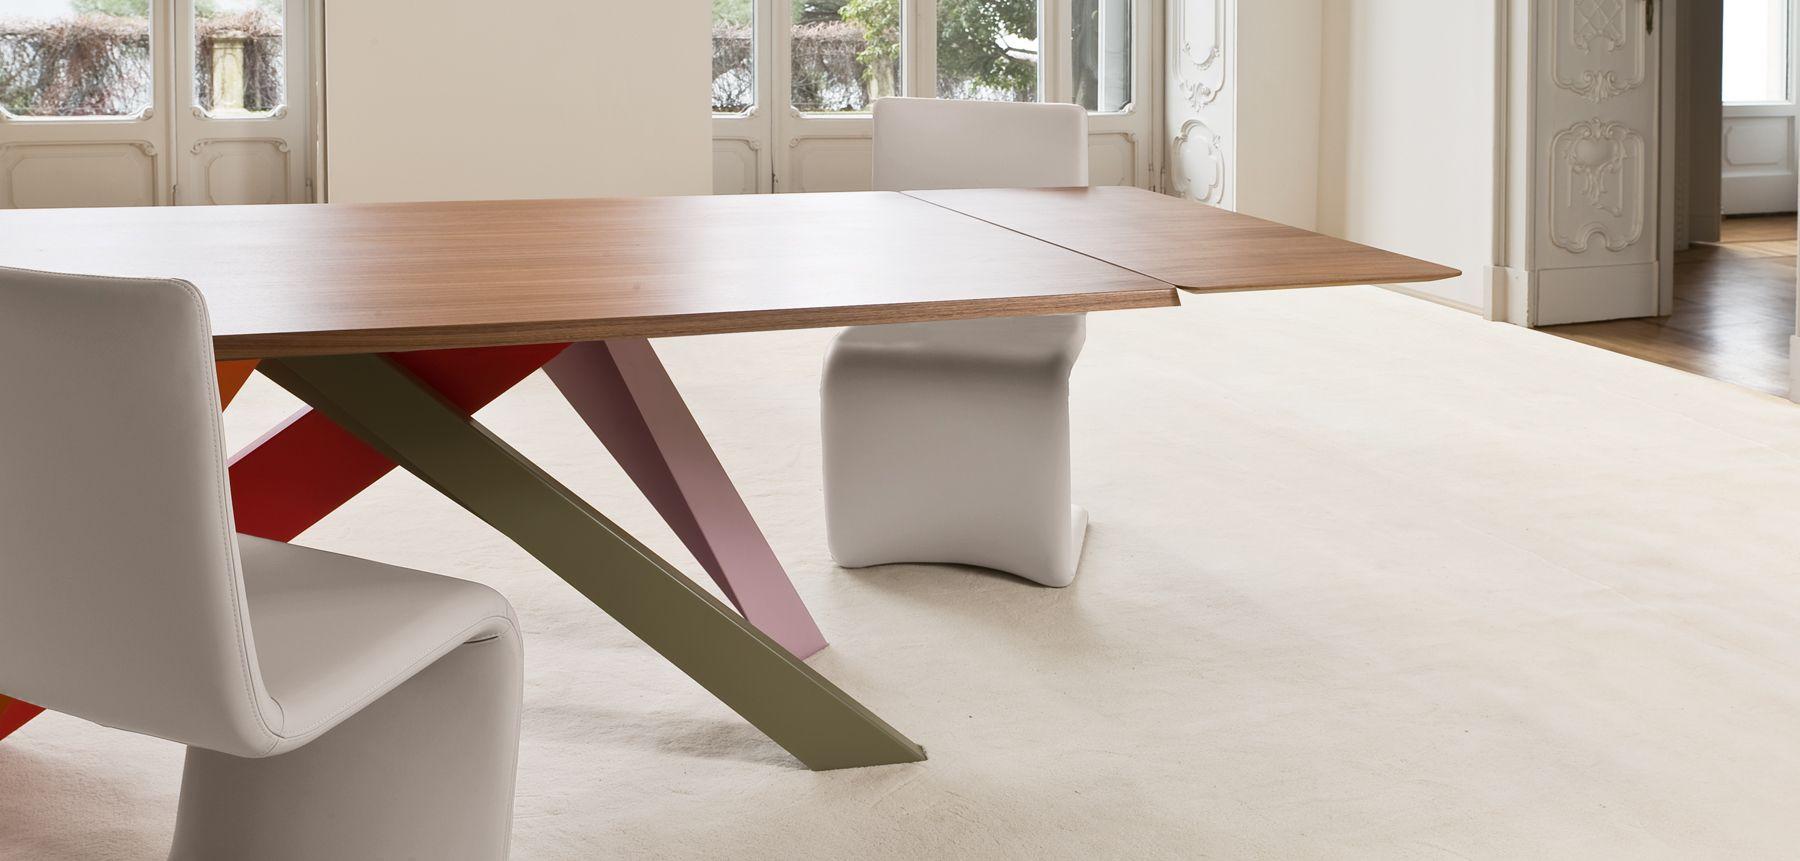 Bonaldo Big Table 3 | Living & Dining | Pinterest | Big, Dining and ...